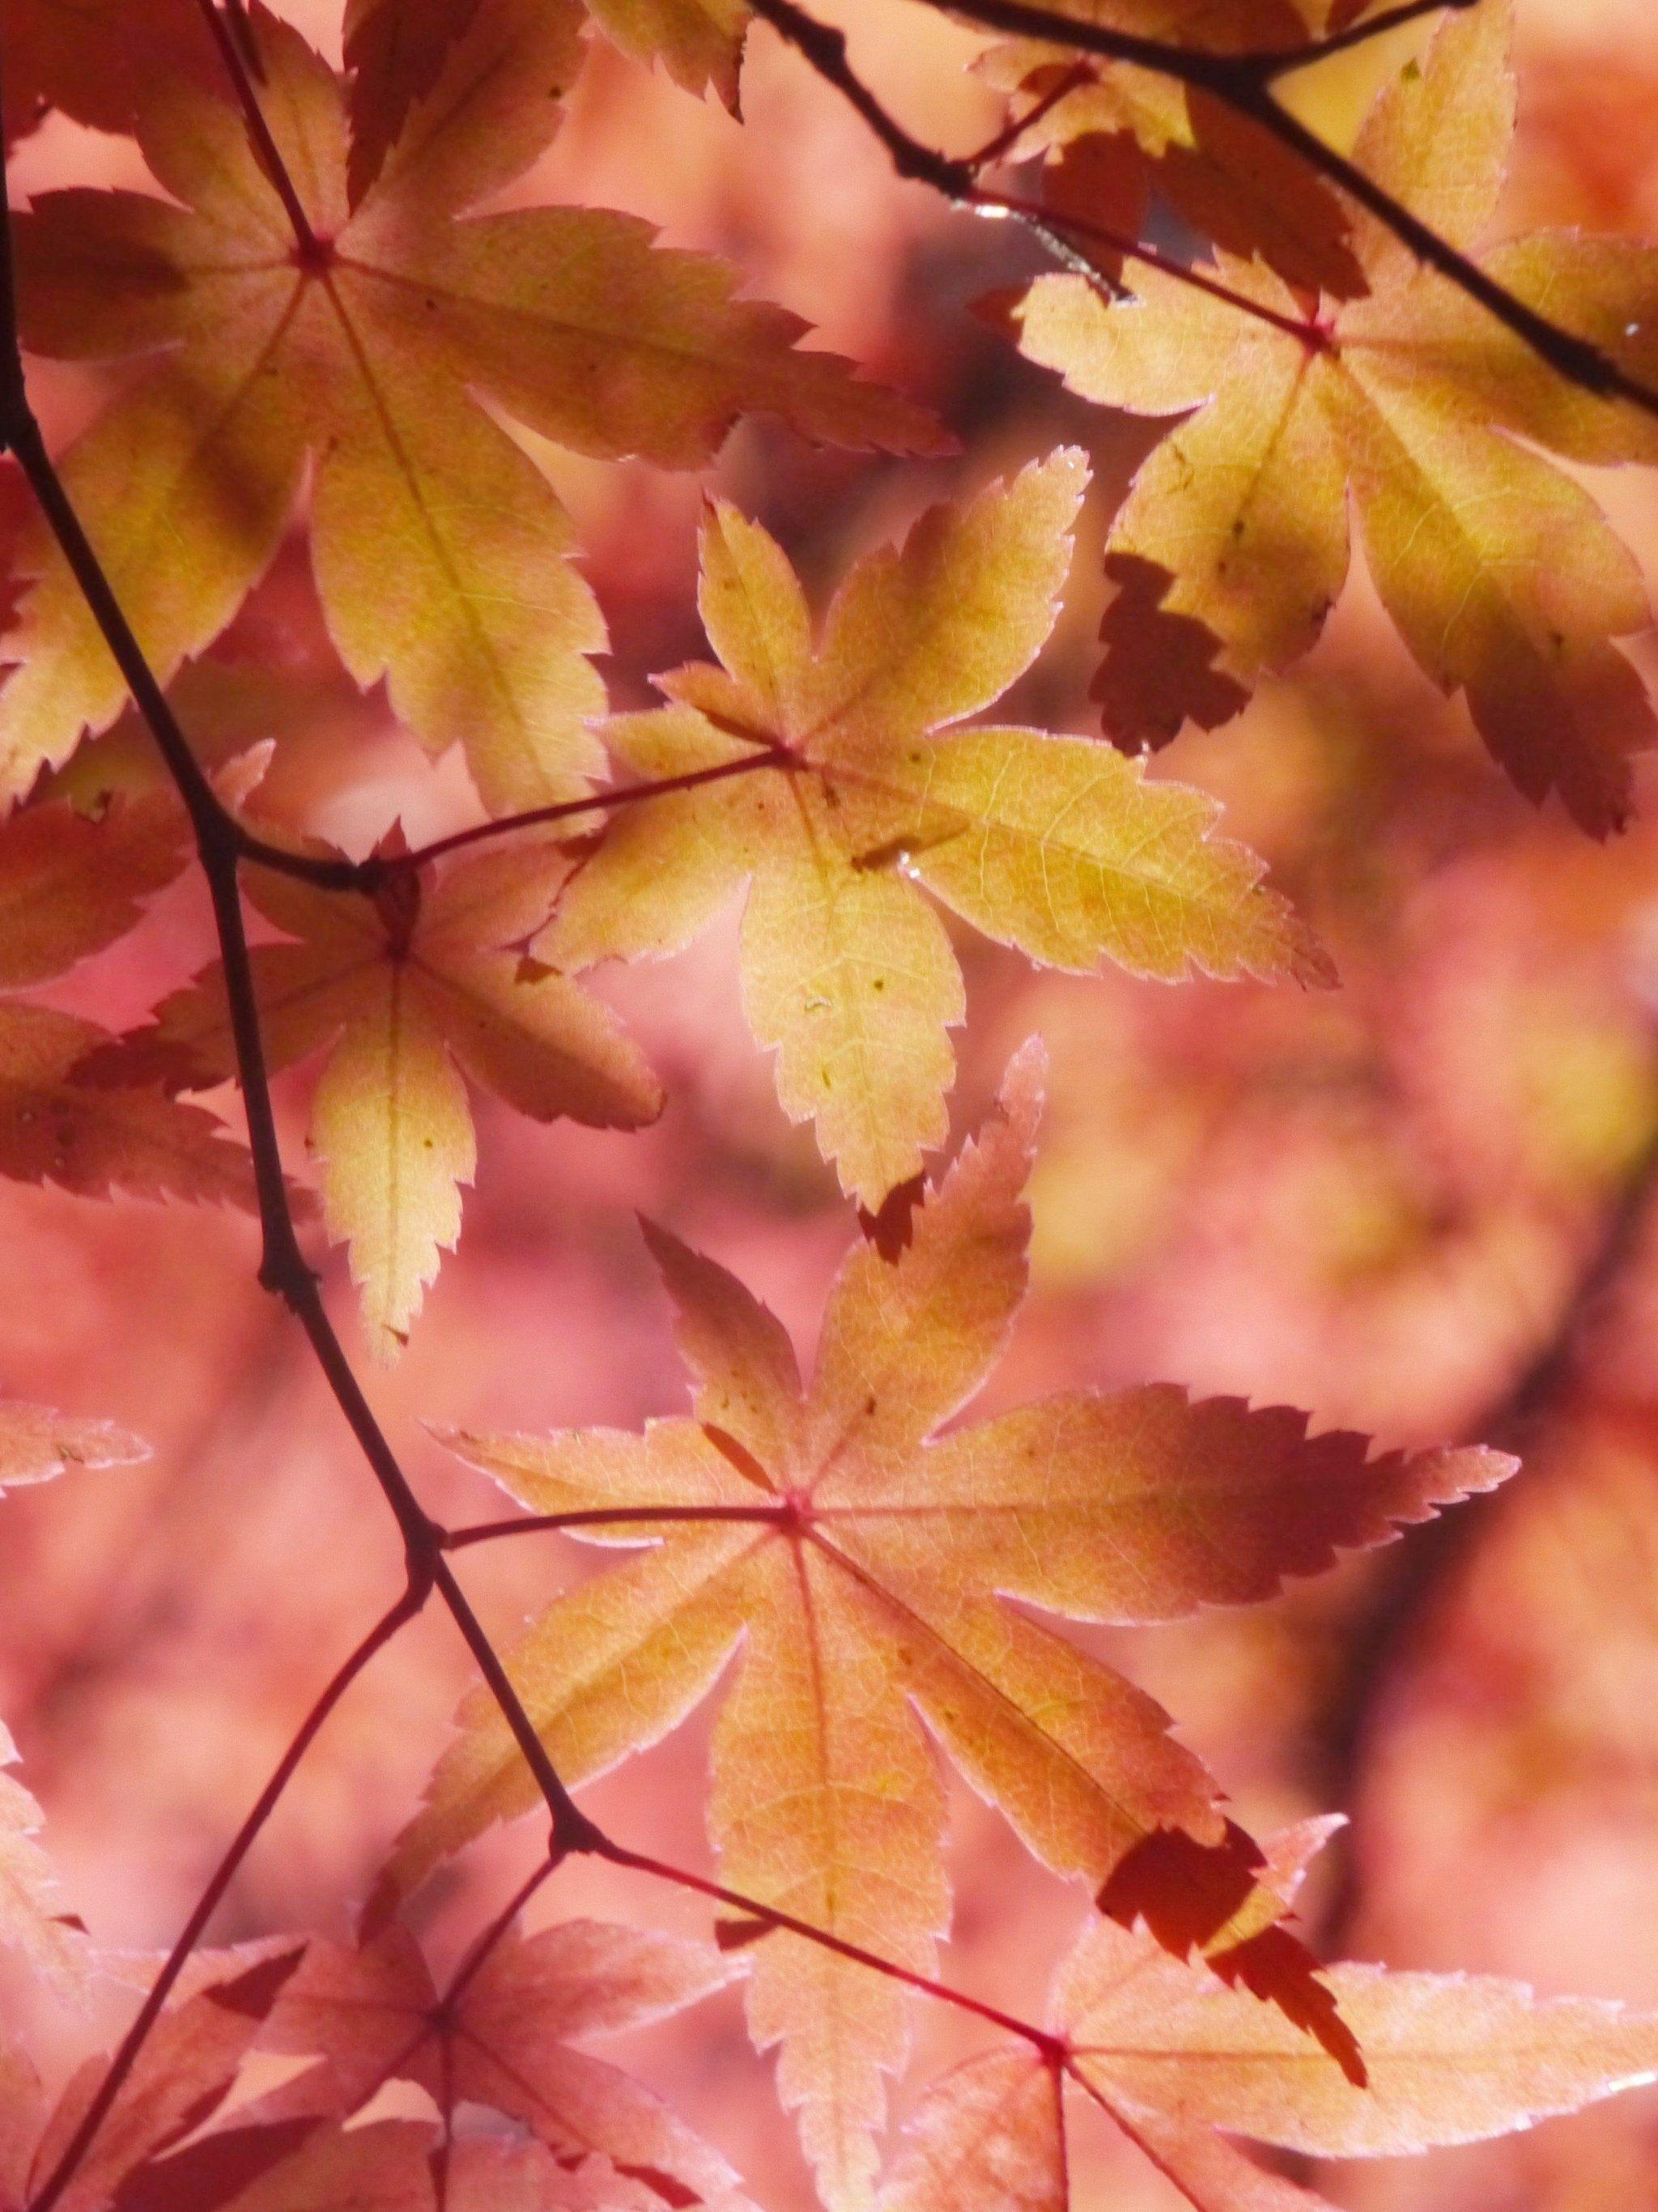 Fall Leaf Wallpaper For Mobile Fall Leaf Wallpapers For Mobile Wallpaper Cave